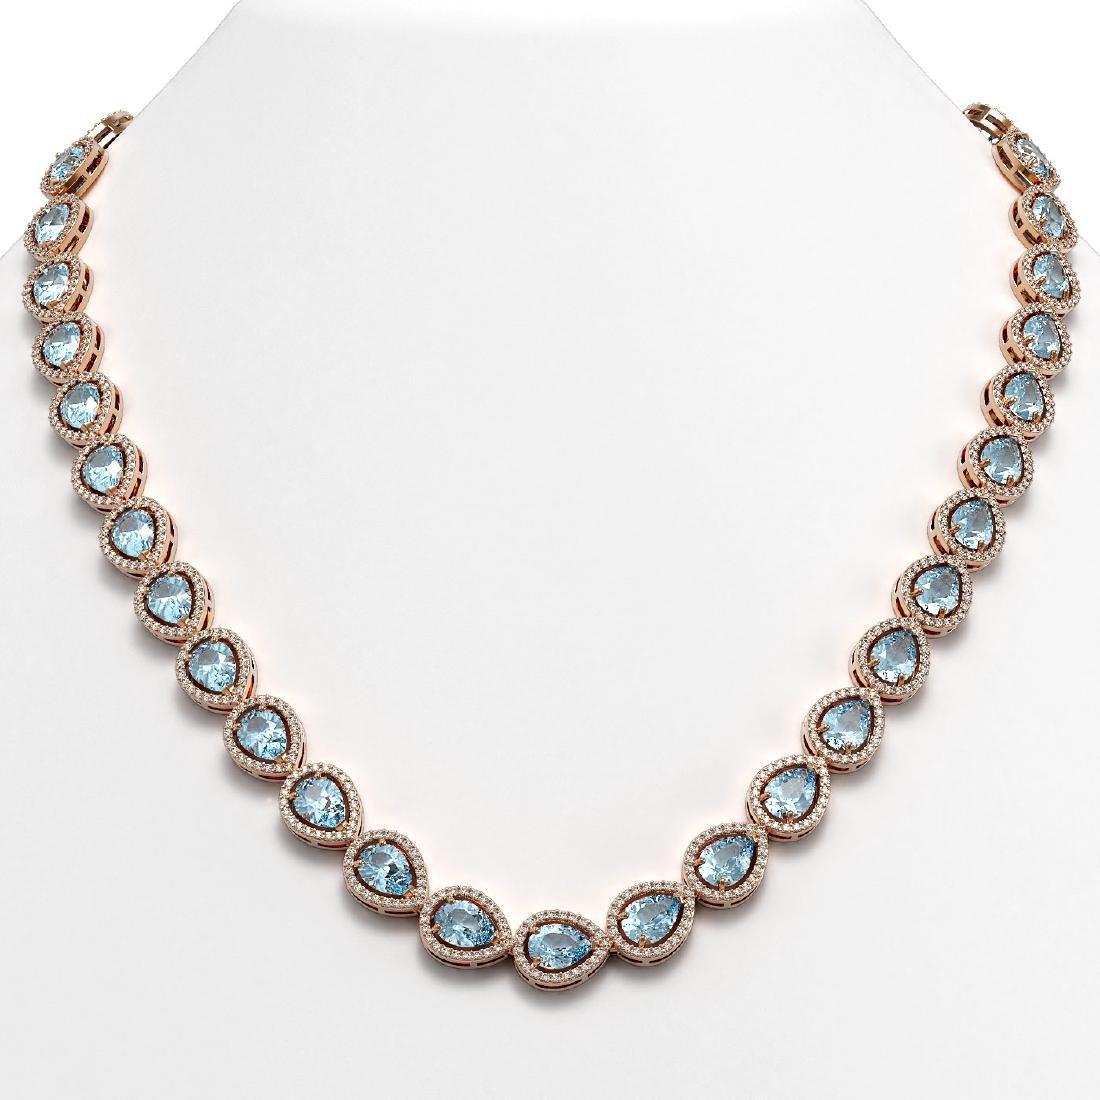 33.35 CTW Aquamarine & Diamond Halo Necklace 10K Rose